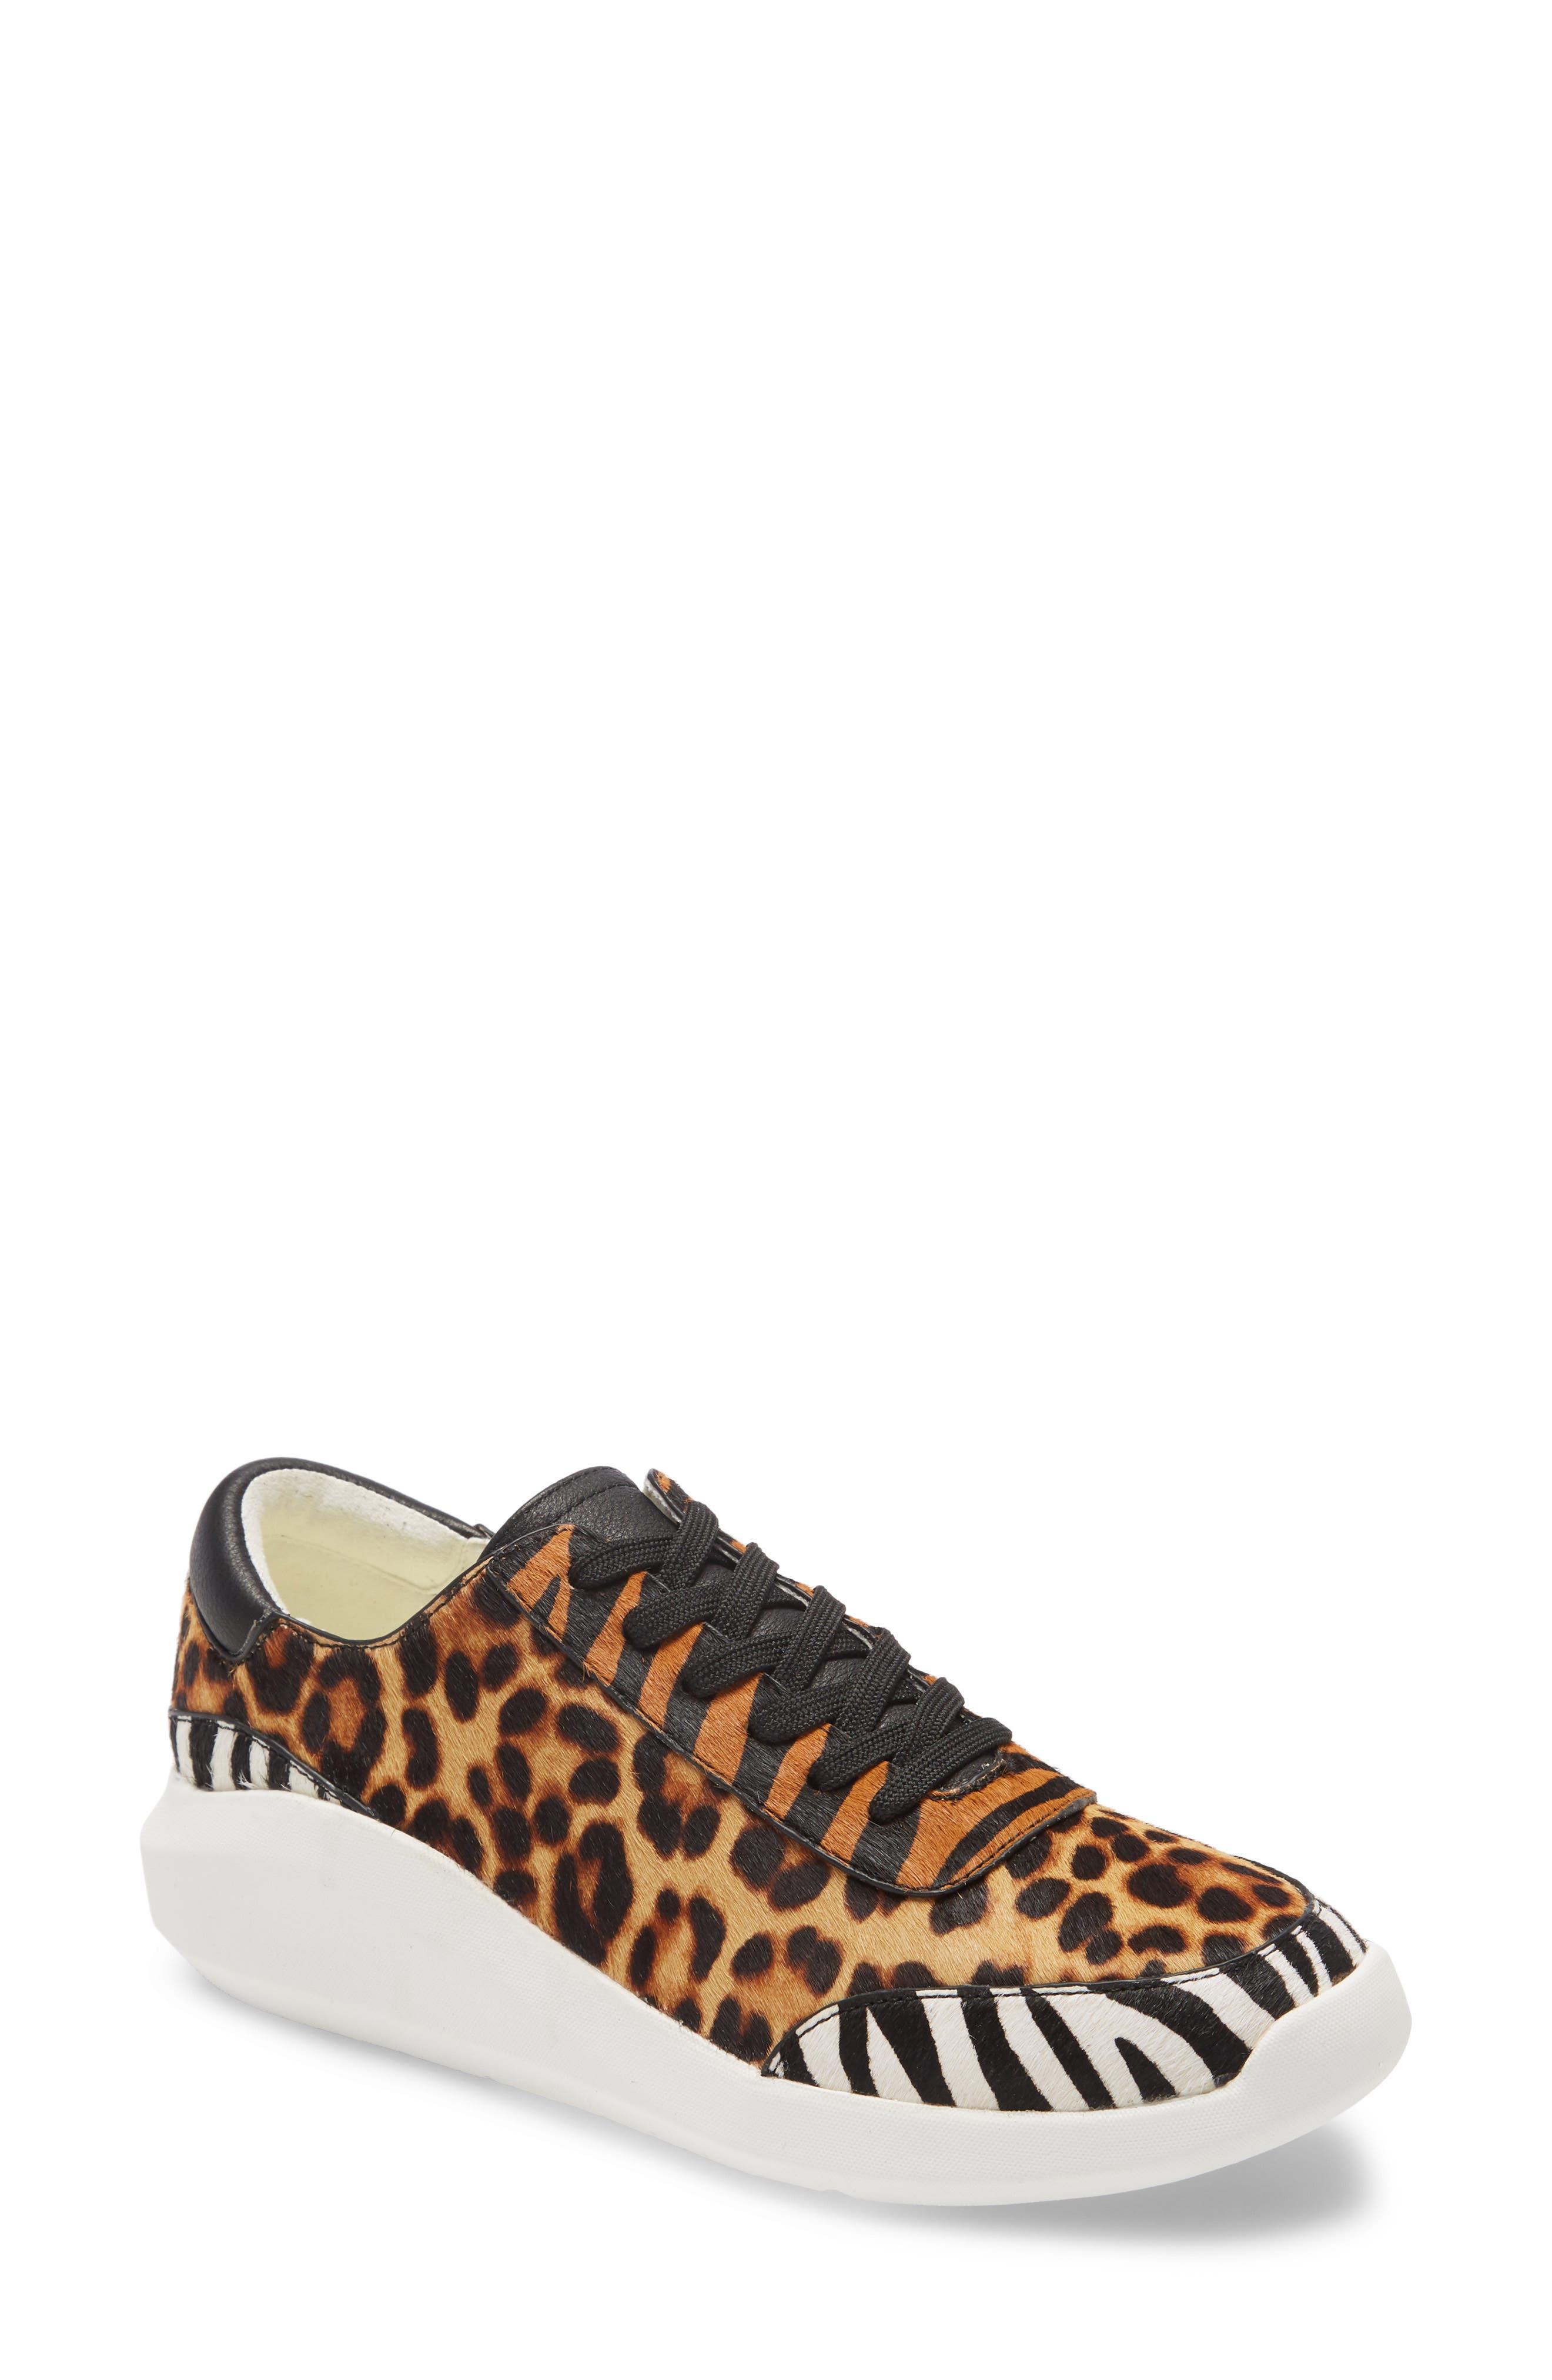 Mello Low Top Sneaker